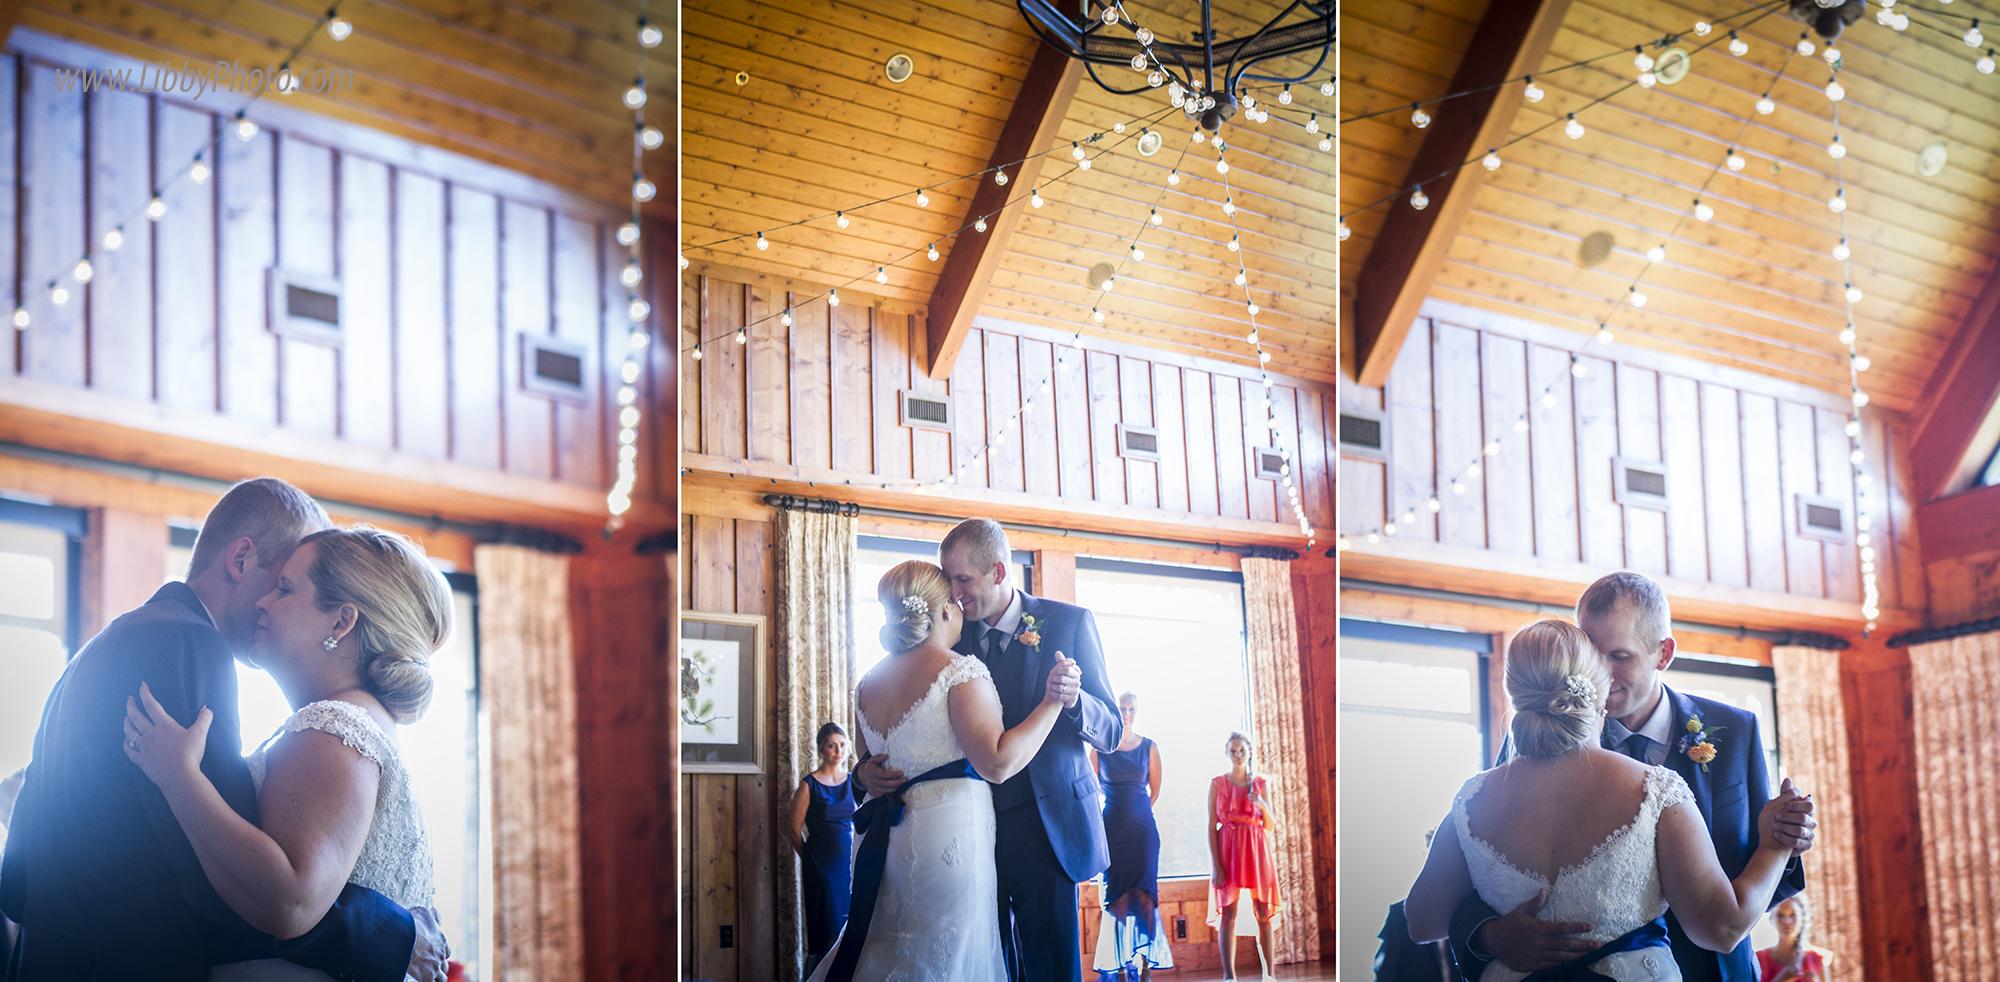 Atlanta wedding photography, Libbyphoto11 (24).jpg